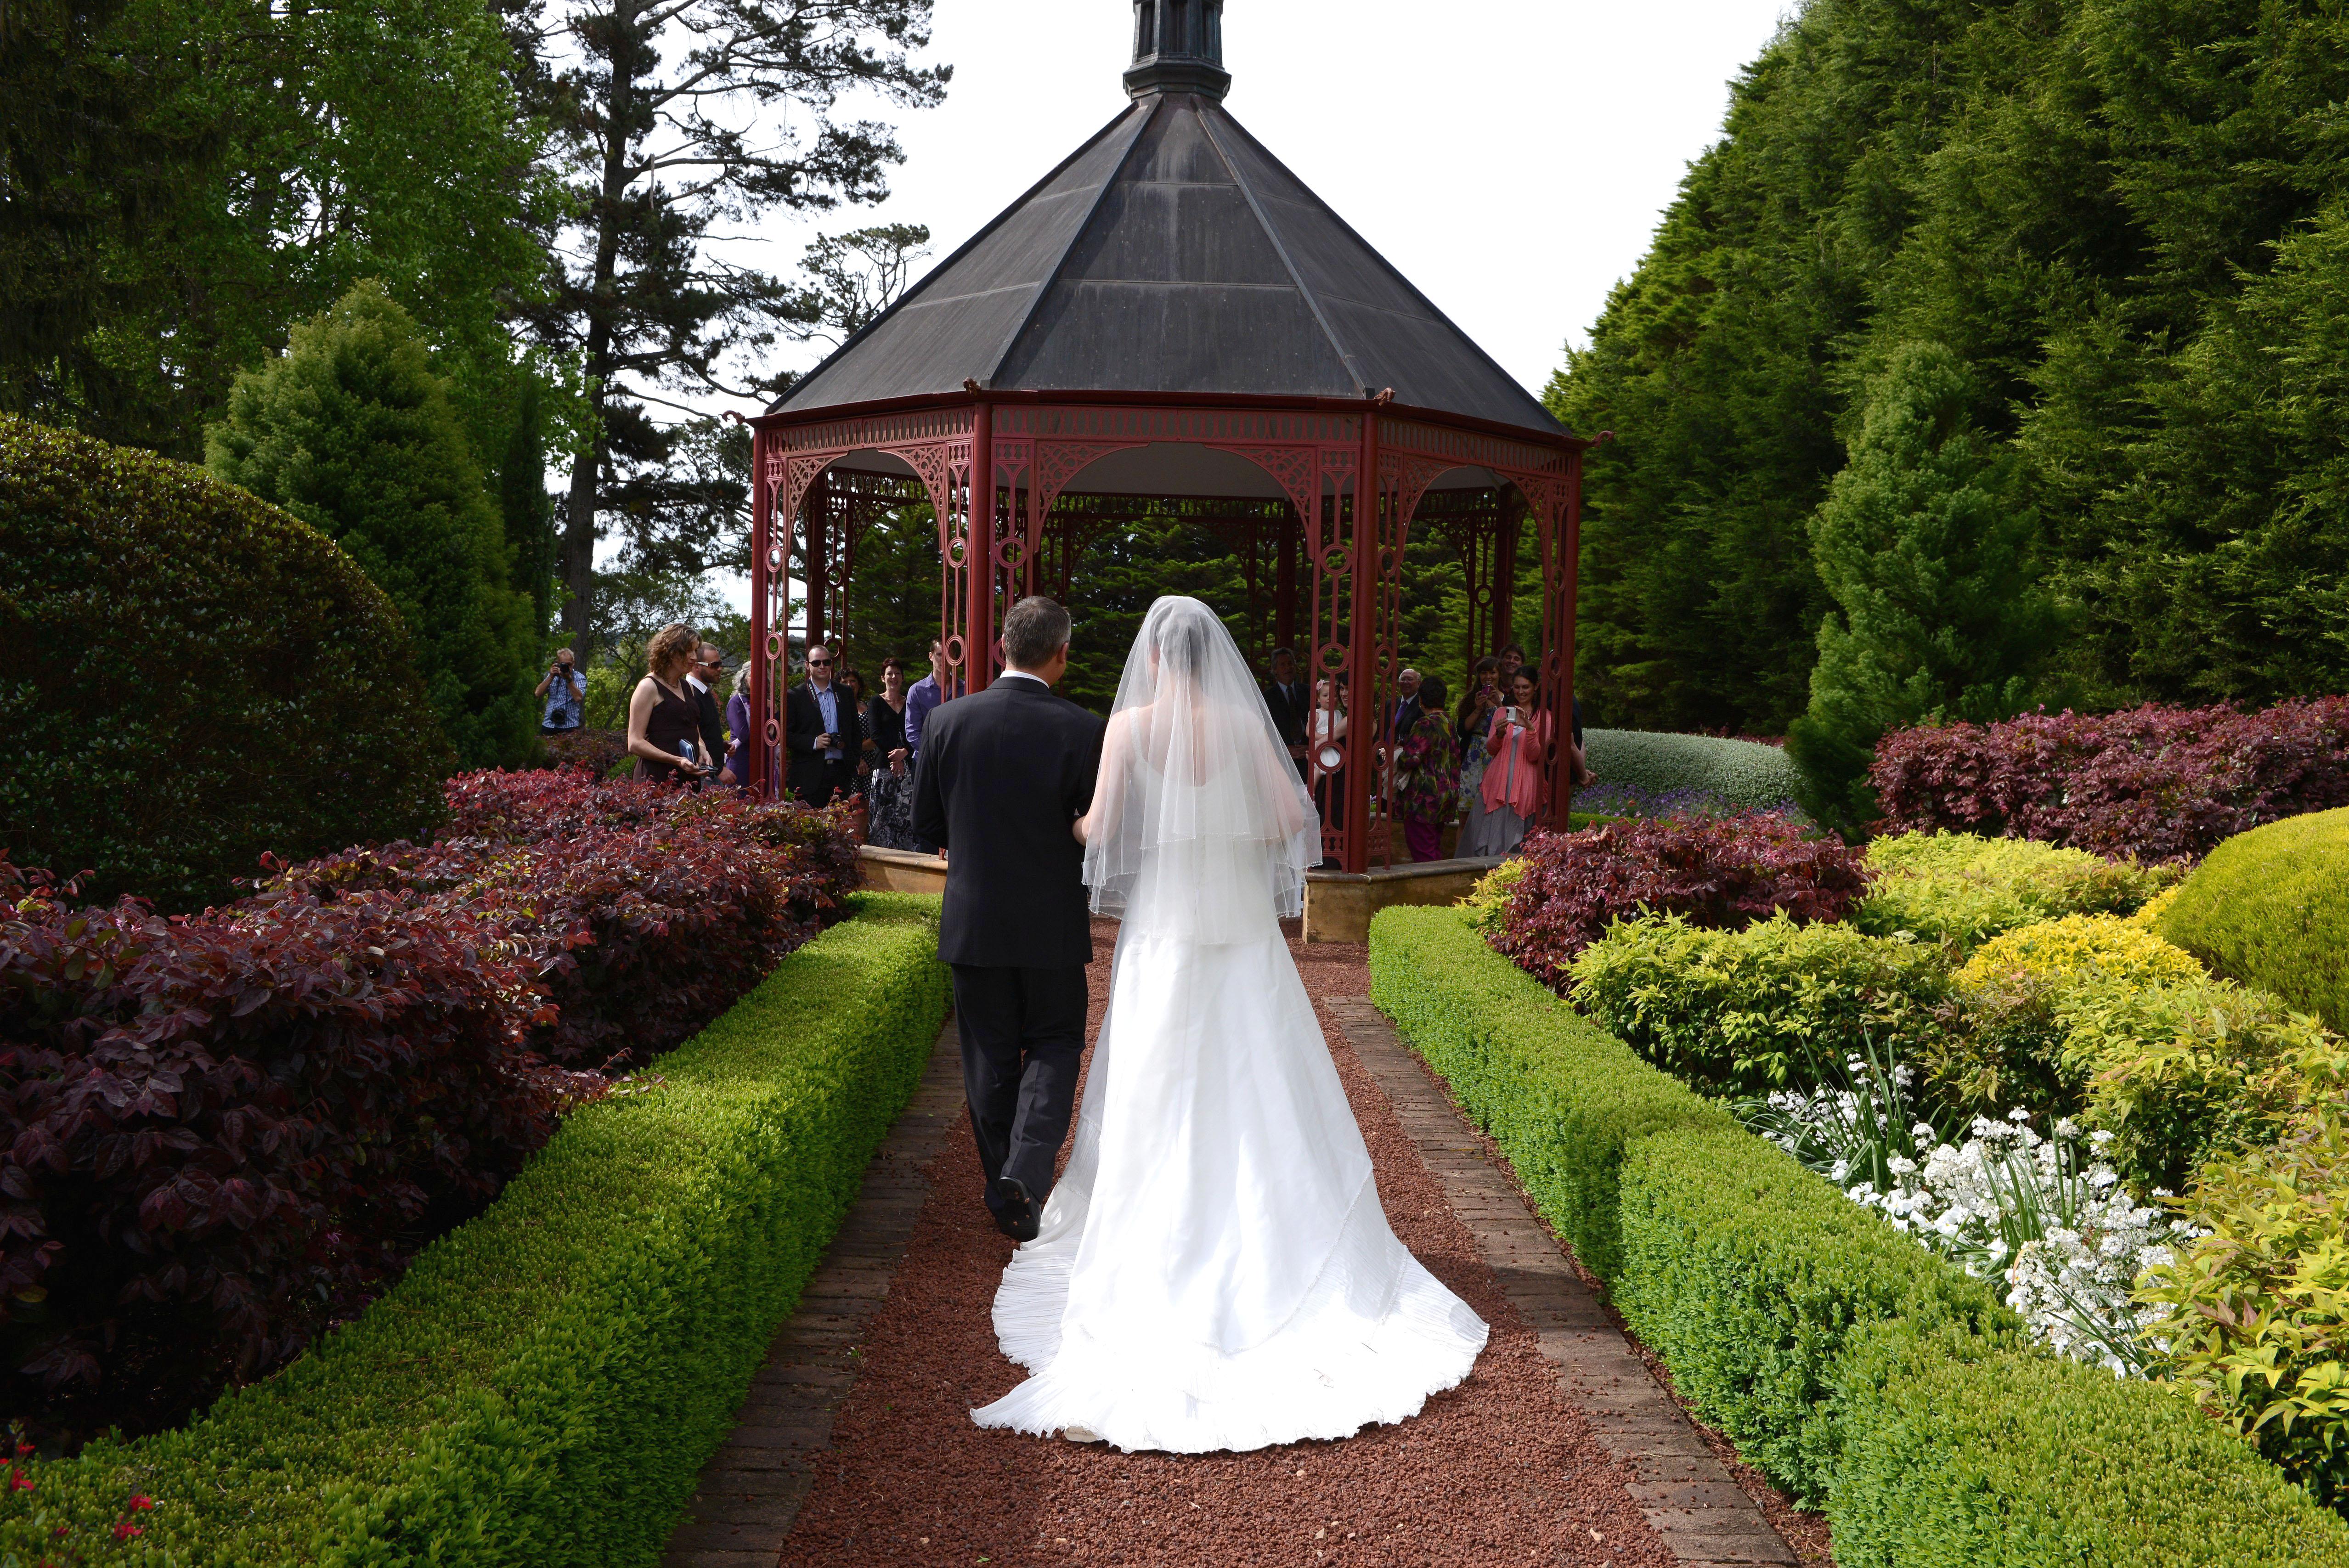 Bride, walking down aisle